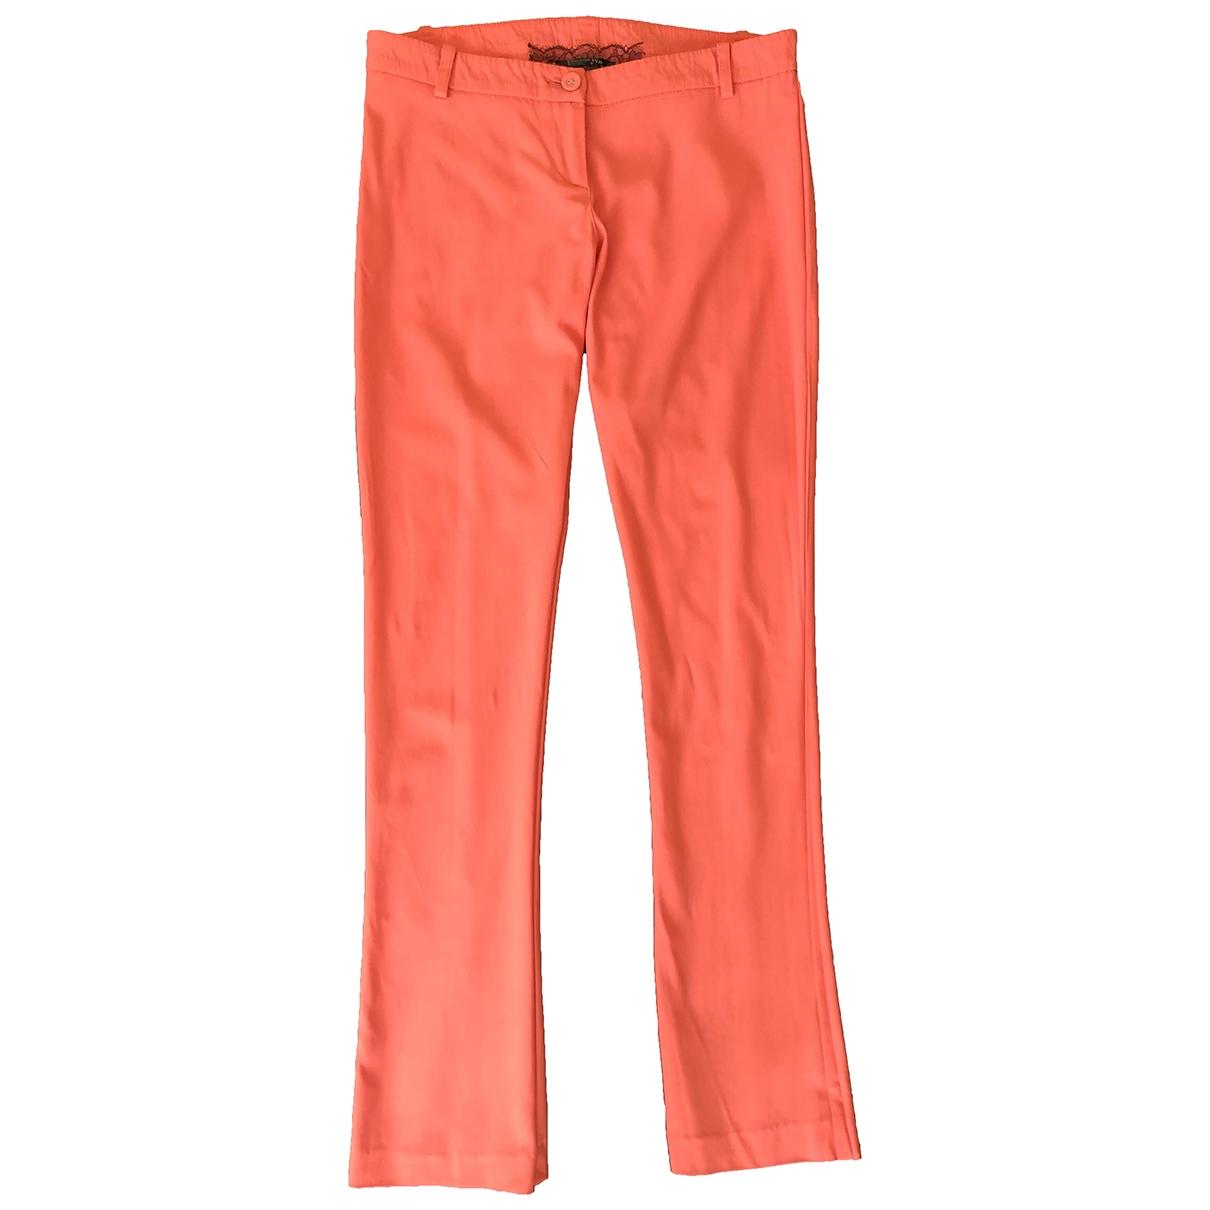 Patrizia Pepe \N Pink Trousers for Women 42 IT